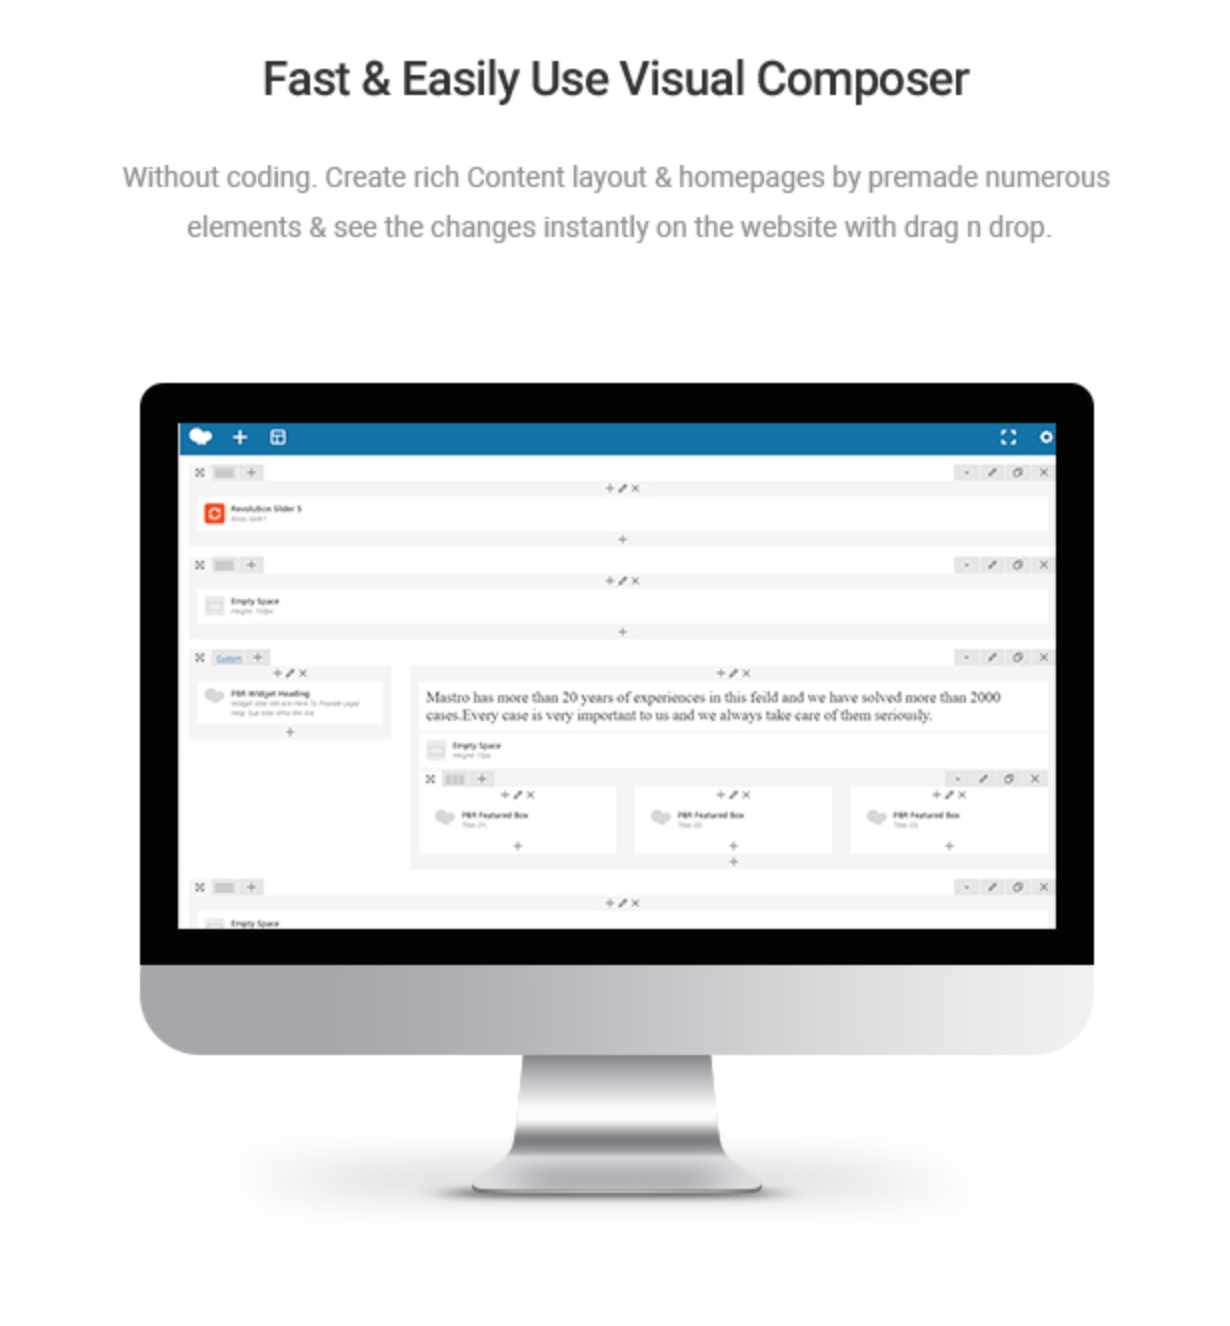 Mastor - Law, Firm & Legal Attorney WordPress Theme Visual Composer